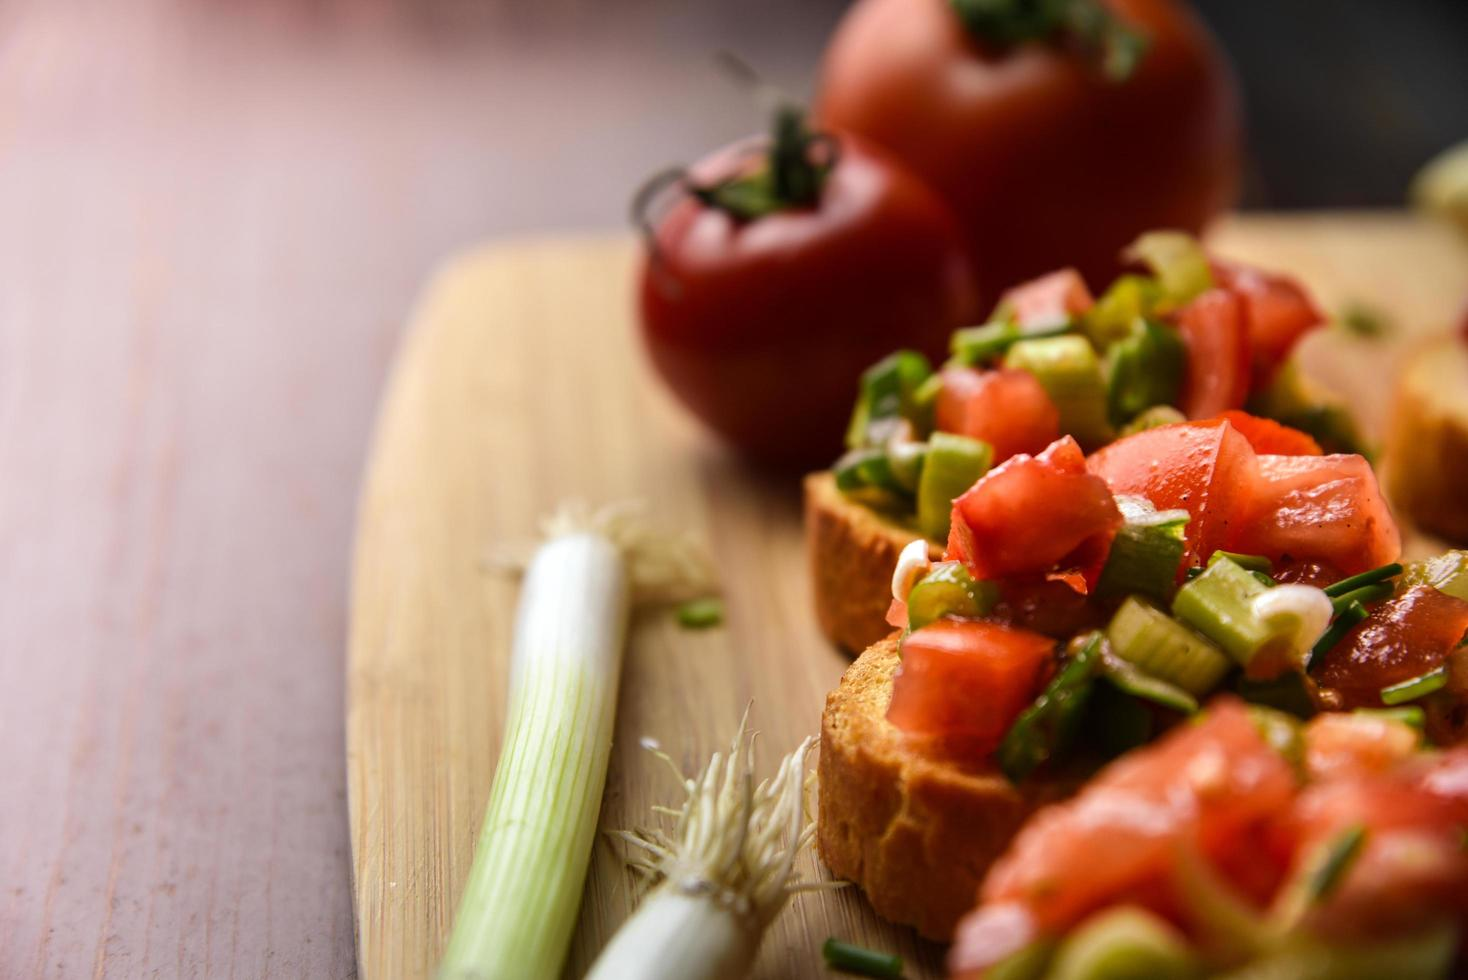 comida mediterránea saludable foto